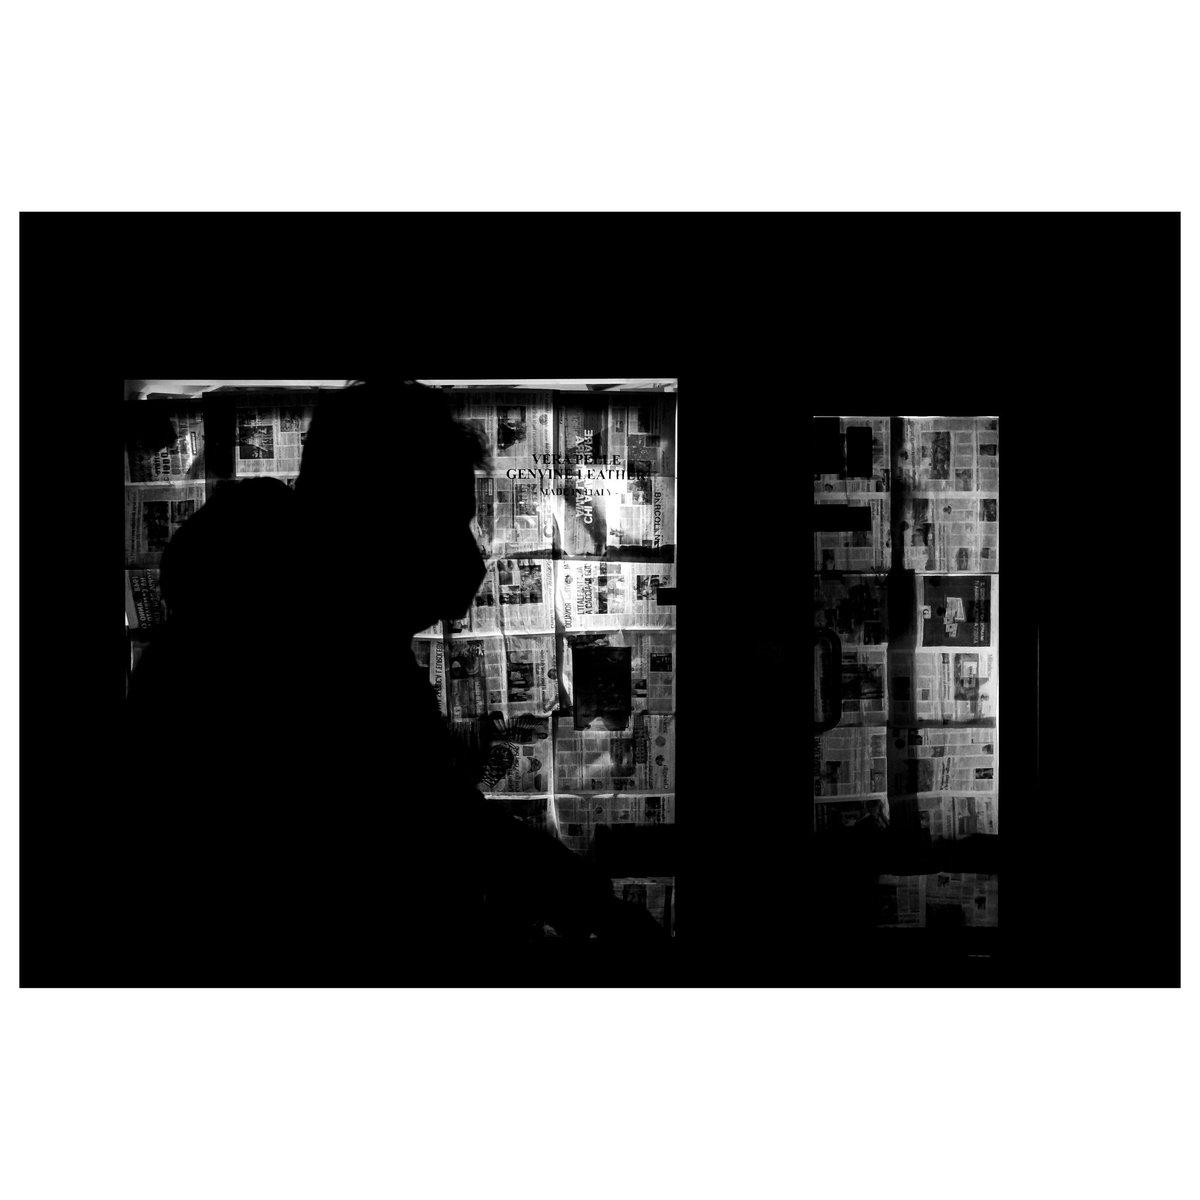 #leica #venice #venezia #streetphoto #monochrome #blackandwhite #bnw #streetphotography